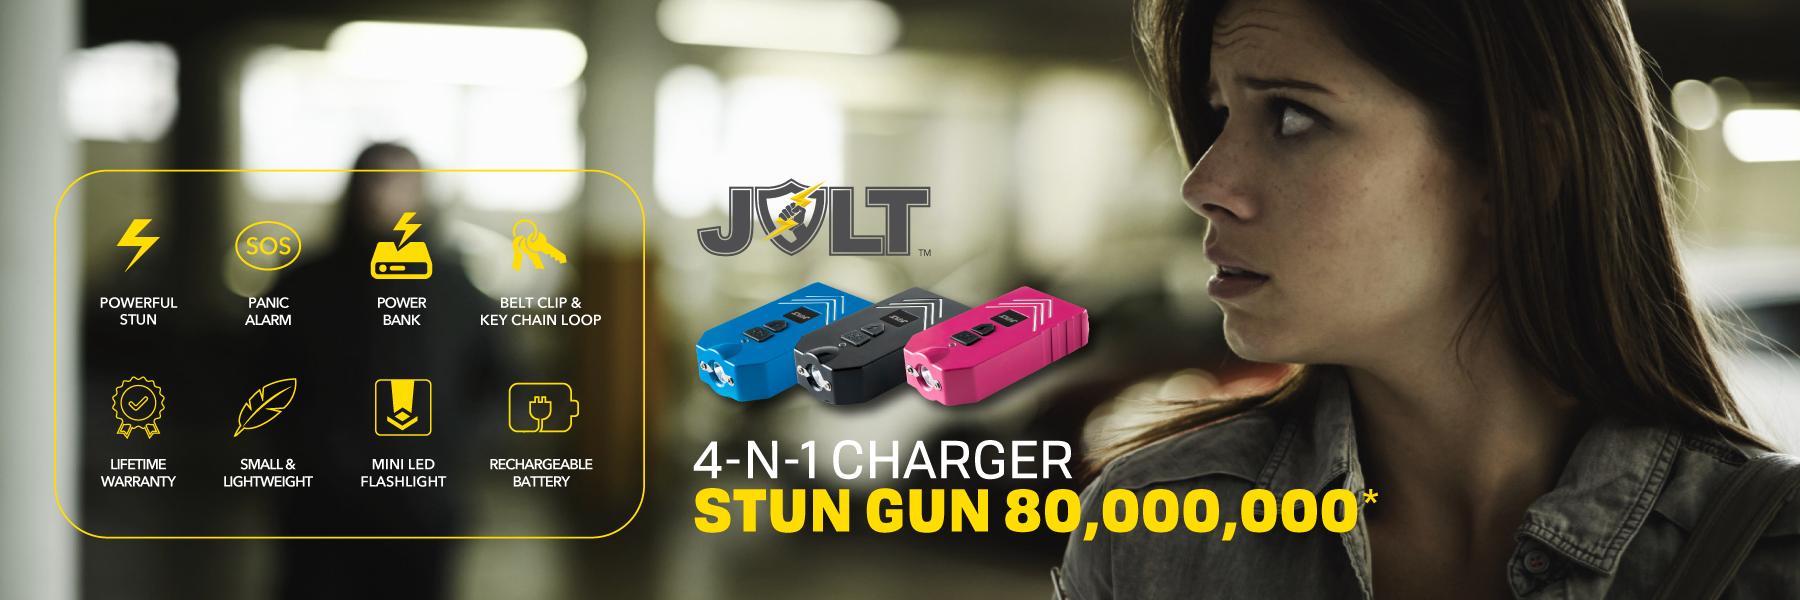 ThugBusters Jolt 4-in-1 Charger Stun gun